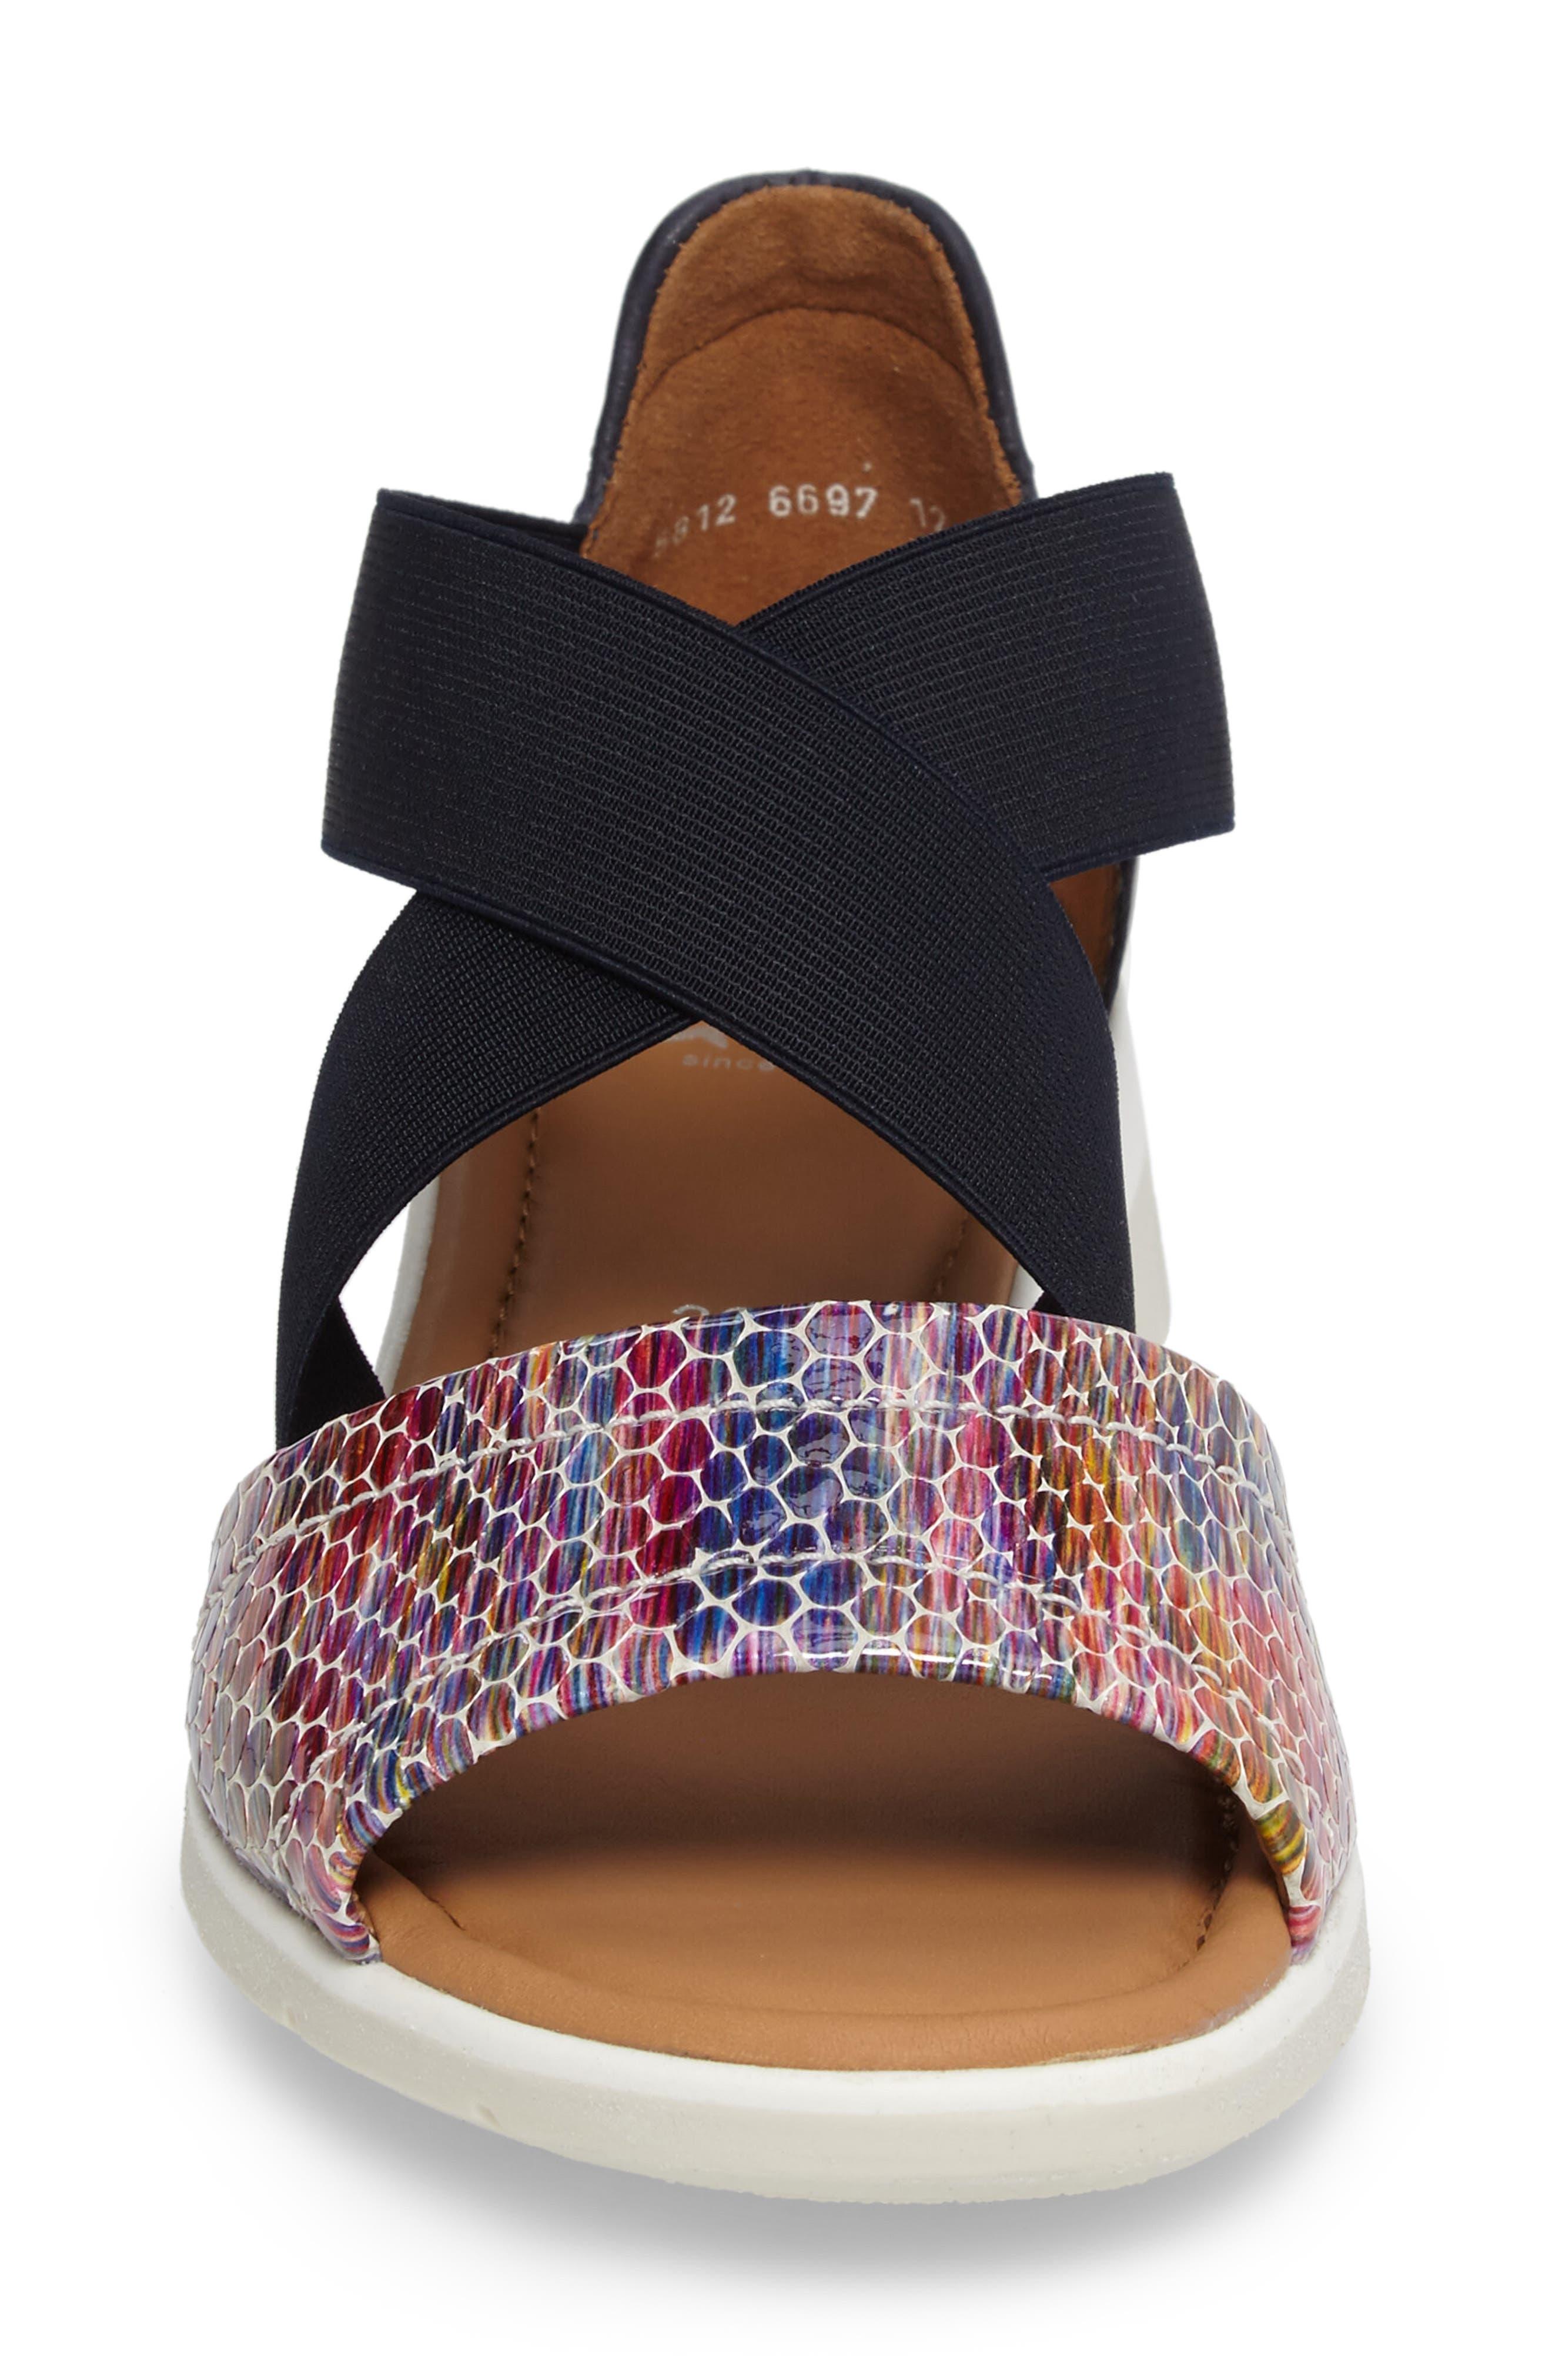 Larissa Cross Strap Wedge Sandal,                             Alternate thumbnail 4, color,                             BLACK MULTI LEATHER